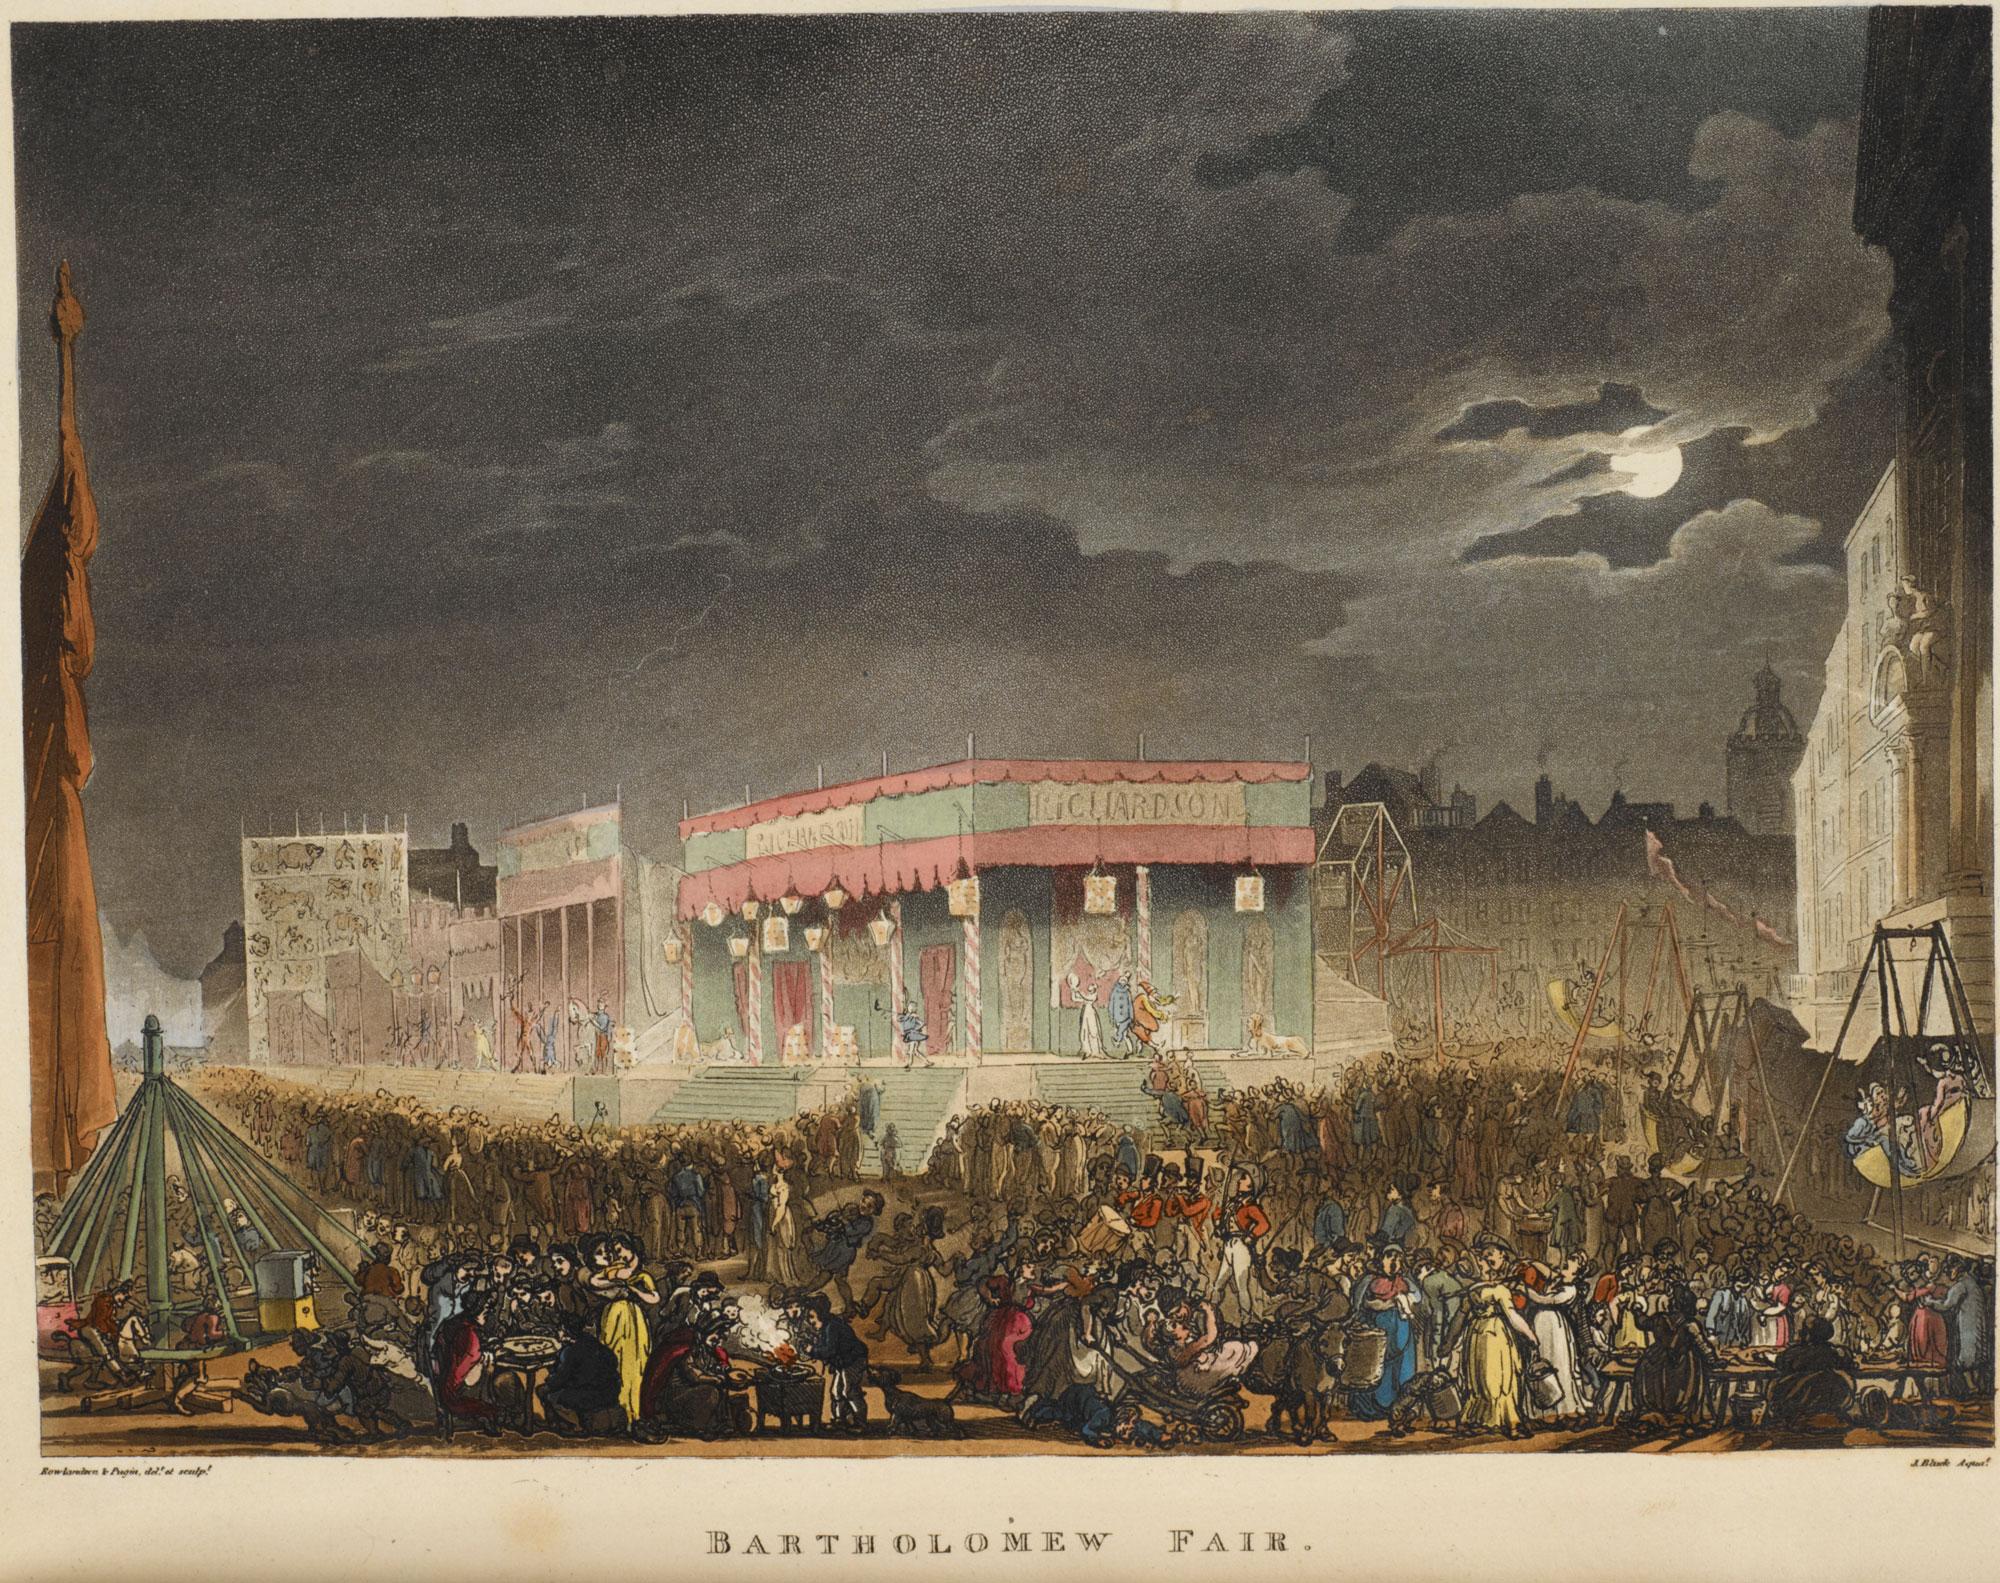 Illustration of Bartholomew Fair